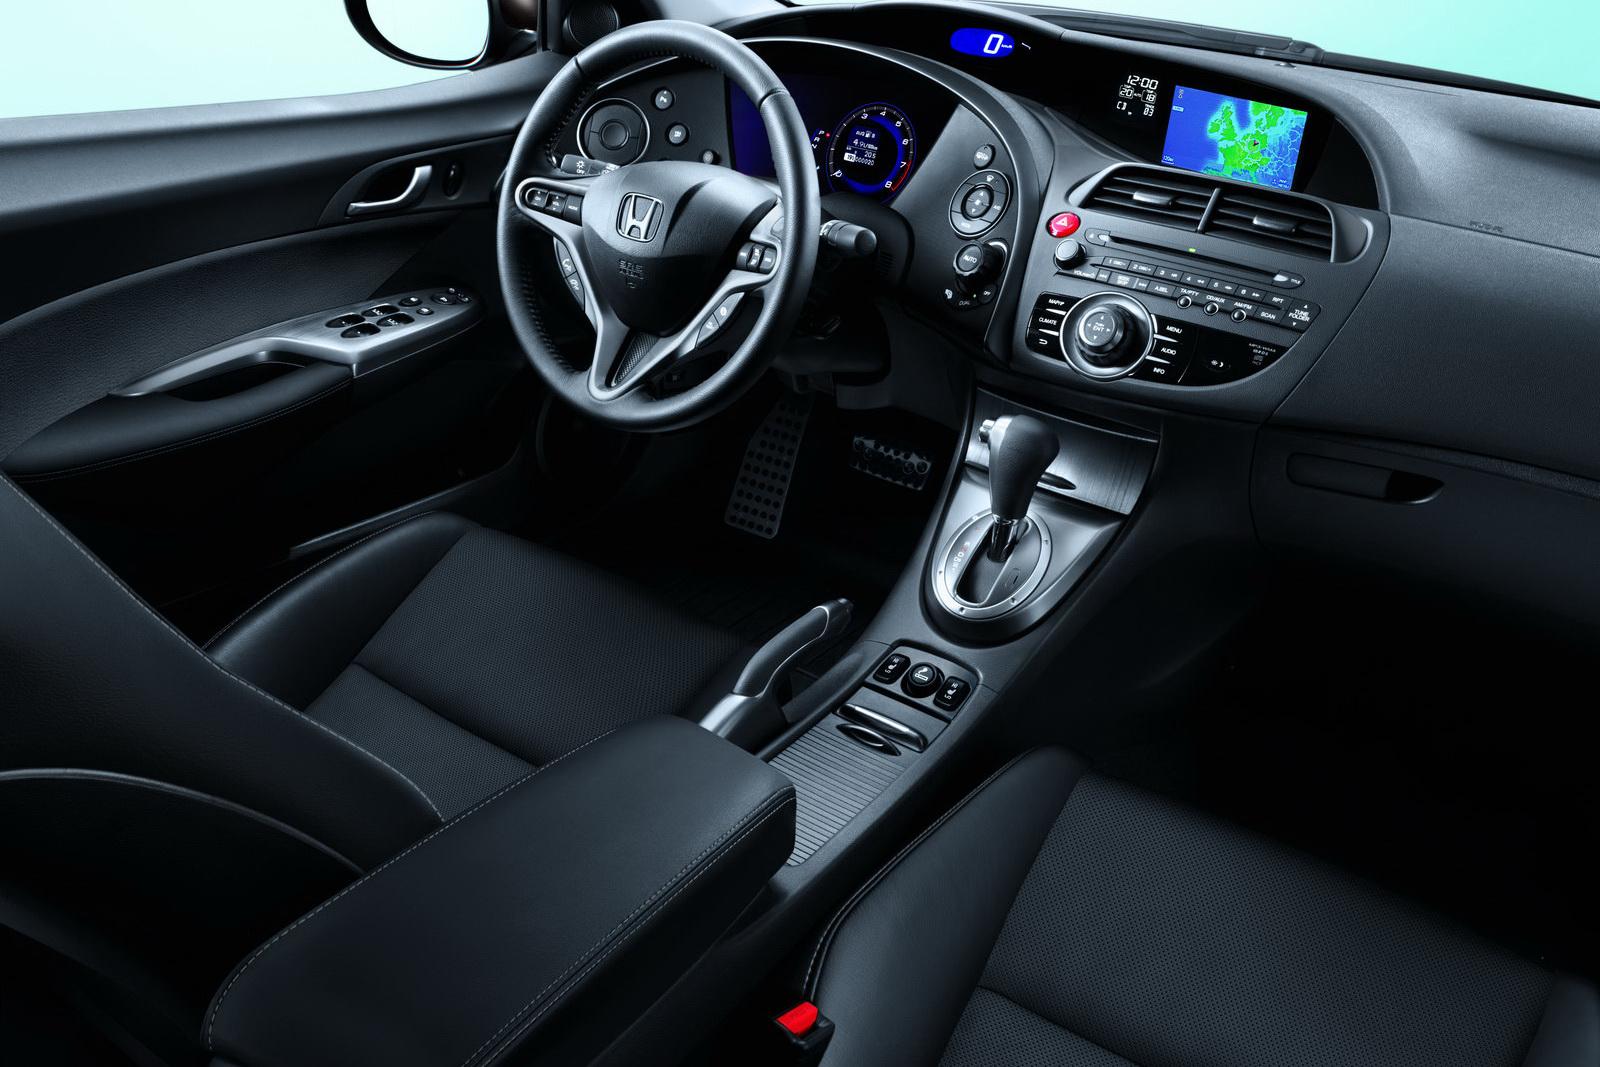 model cars of the world 2011 honda civic interior. Black Bedroom Furniture Sets. Home Design Ideas